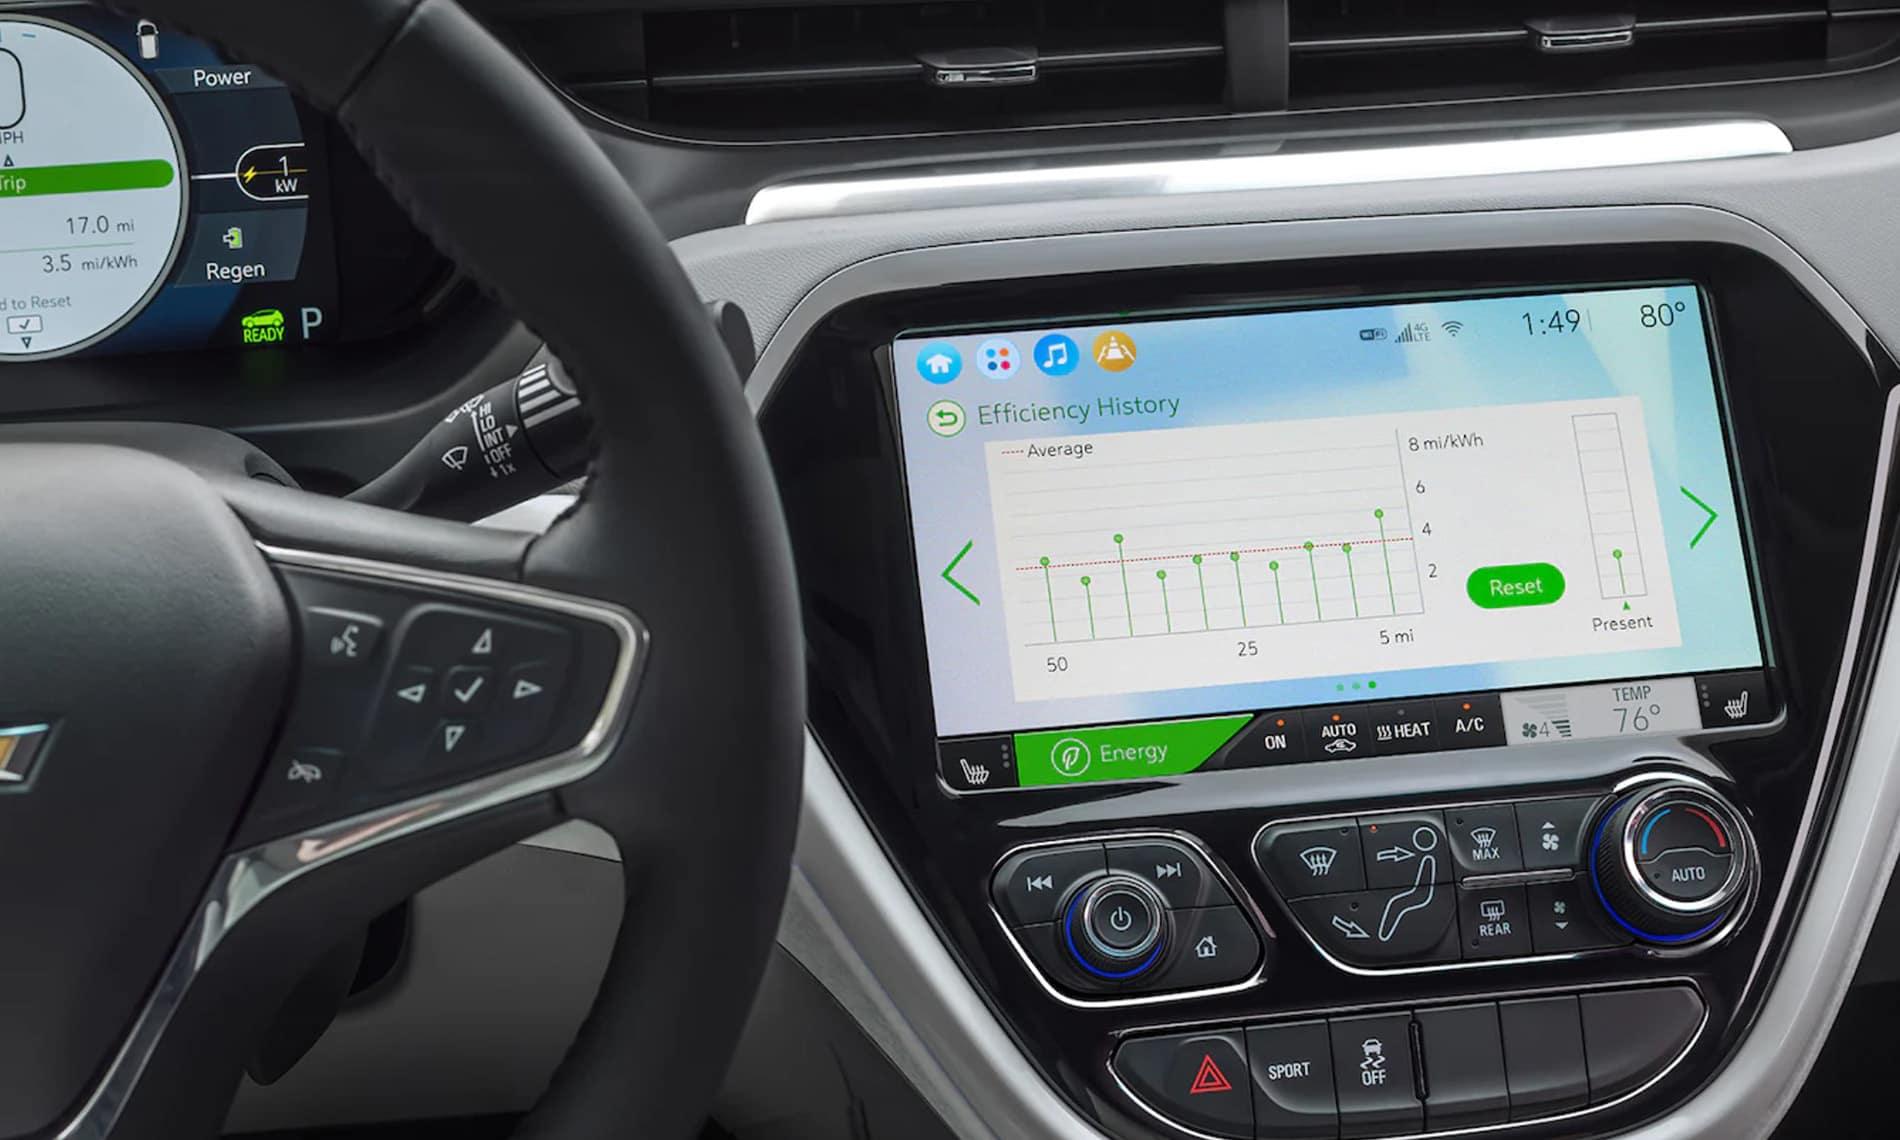 2021 Chevrolet Bolt EV in St. Louis